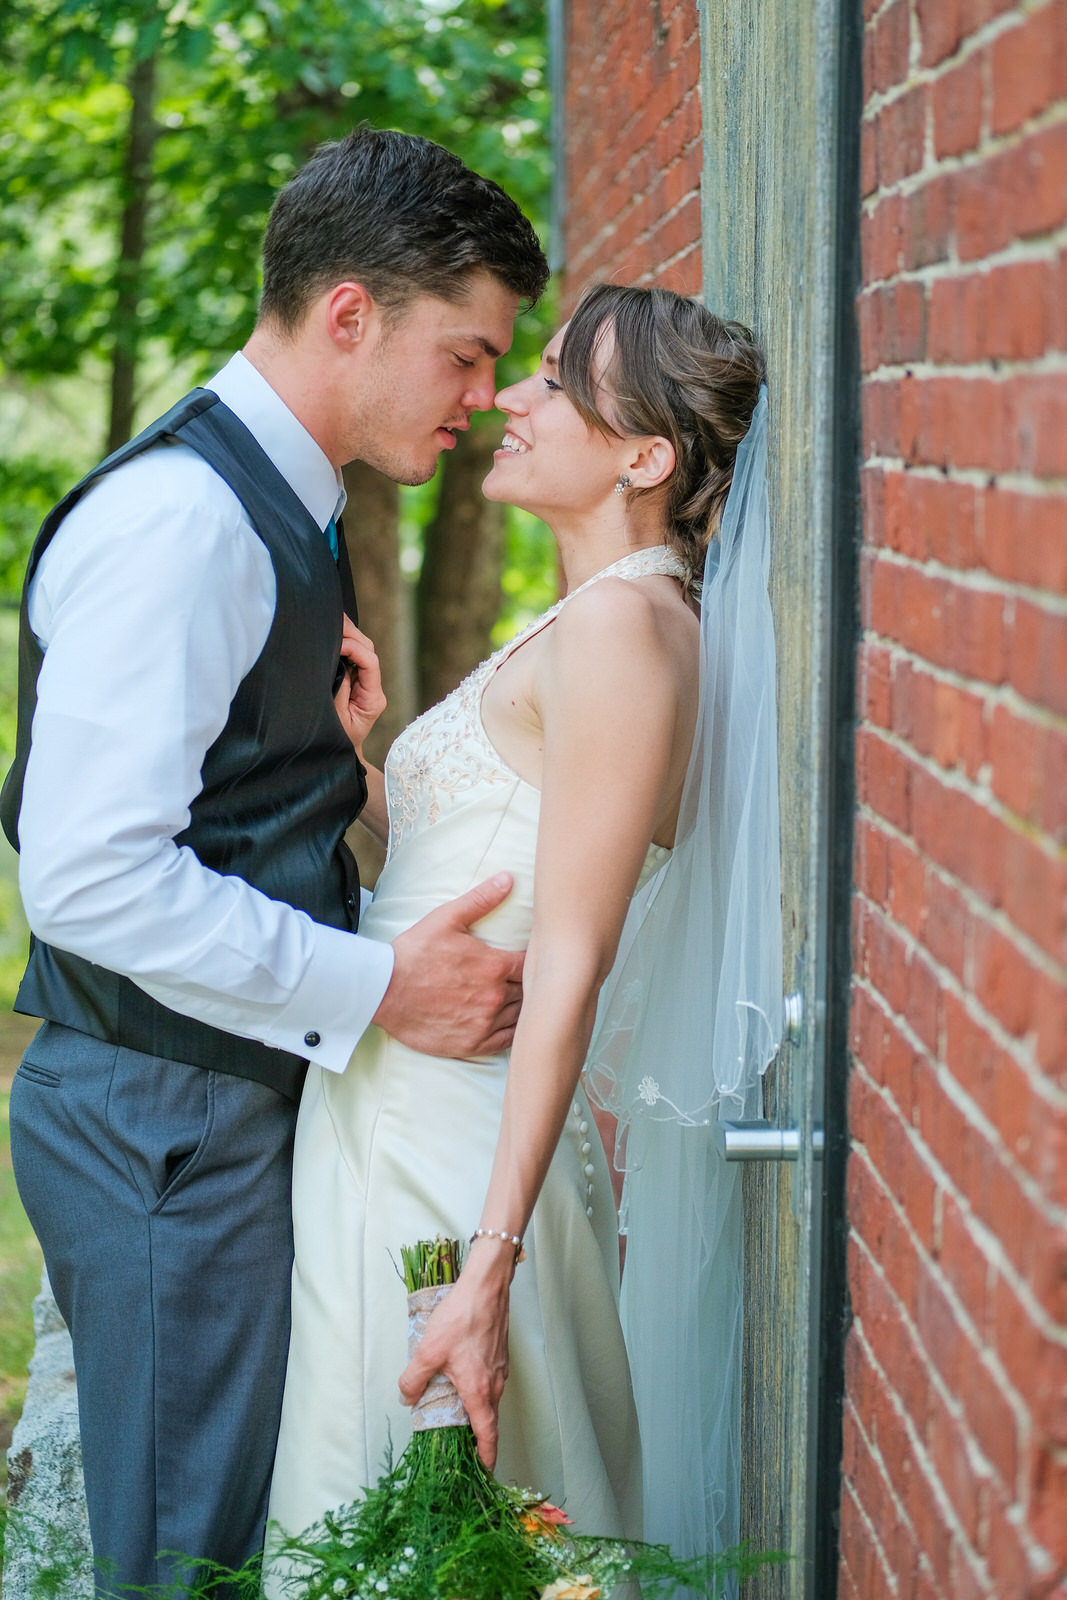 southern-nh-wedding-photography-850-1.jpg